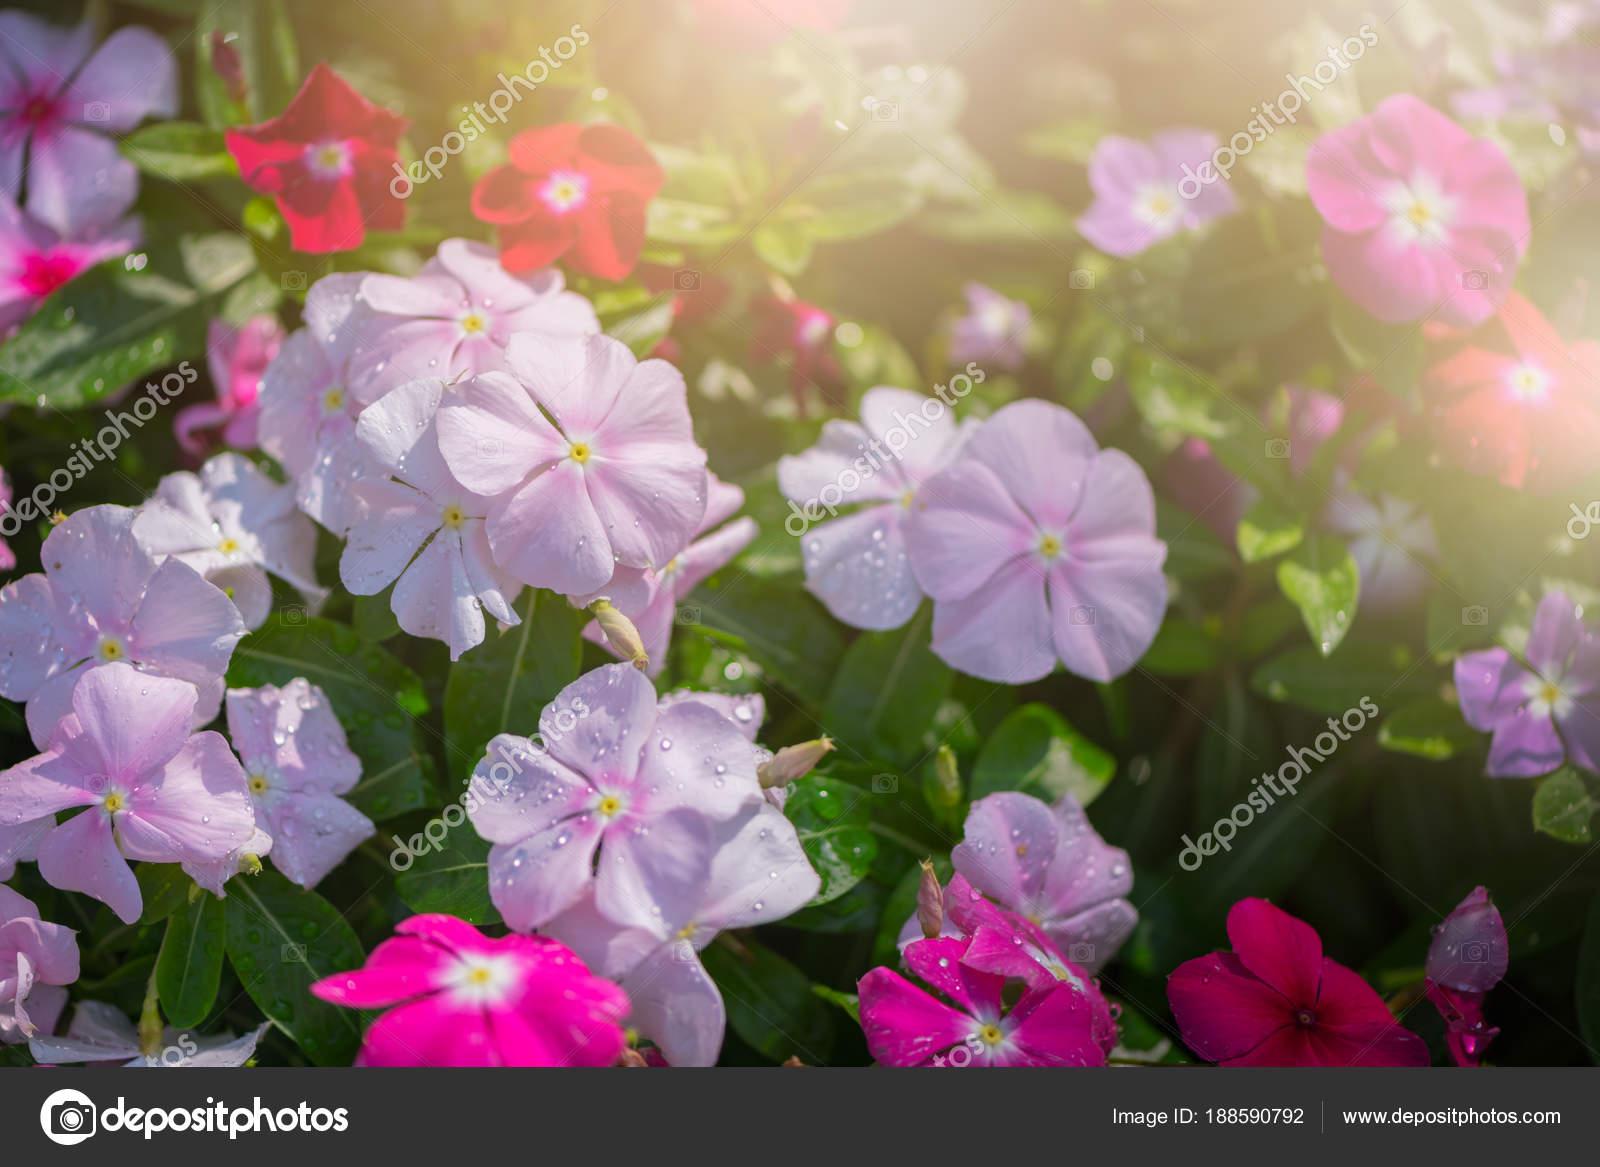 Madagascar Periwinkle Flower In Garden Stock Photo